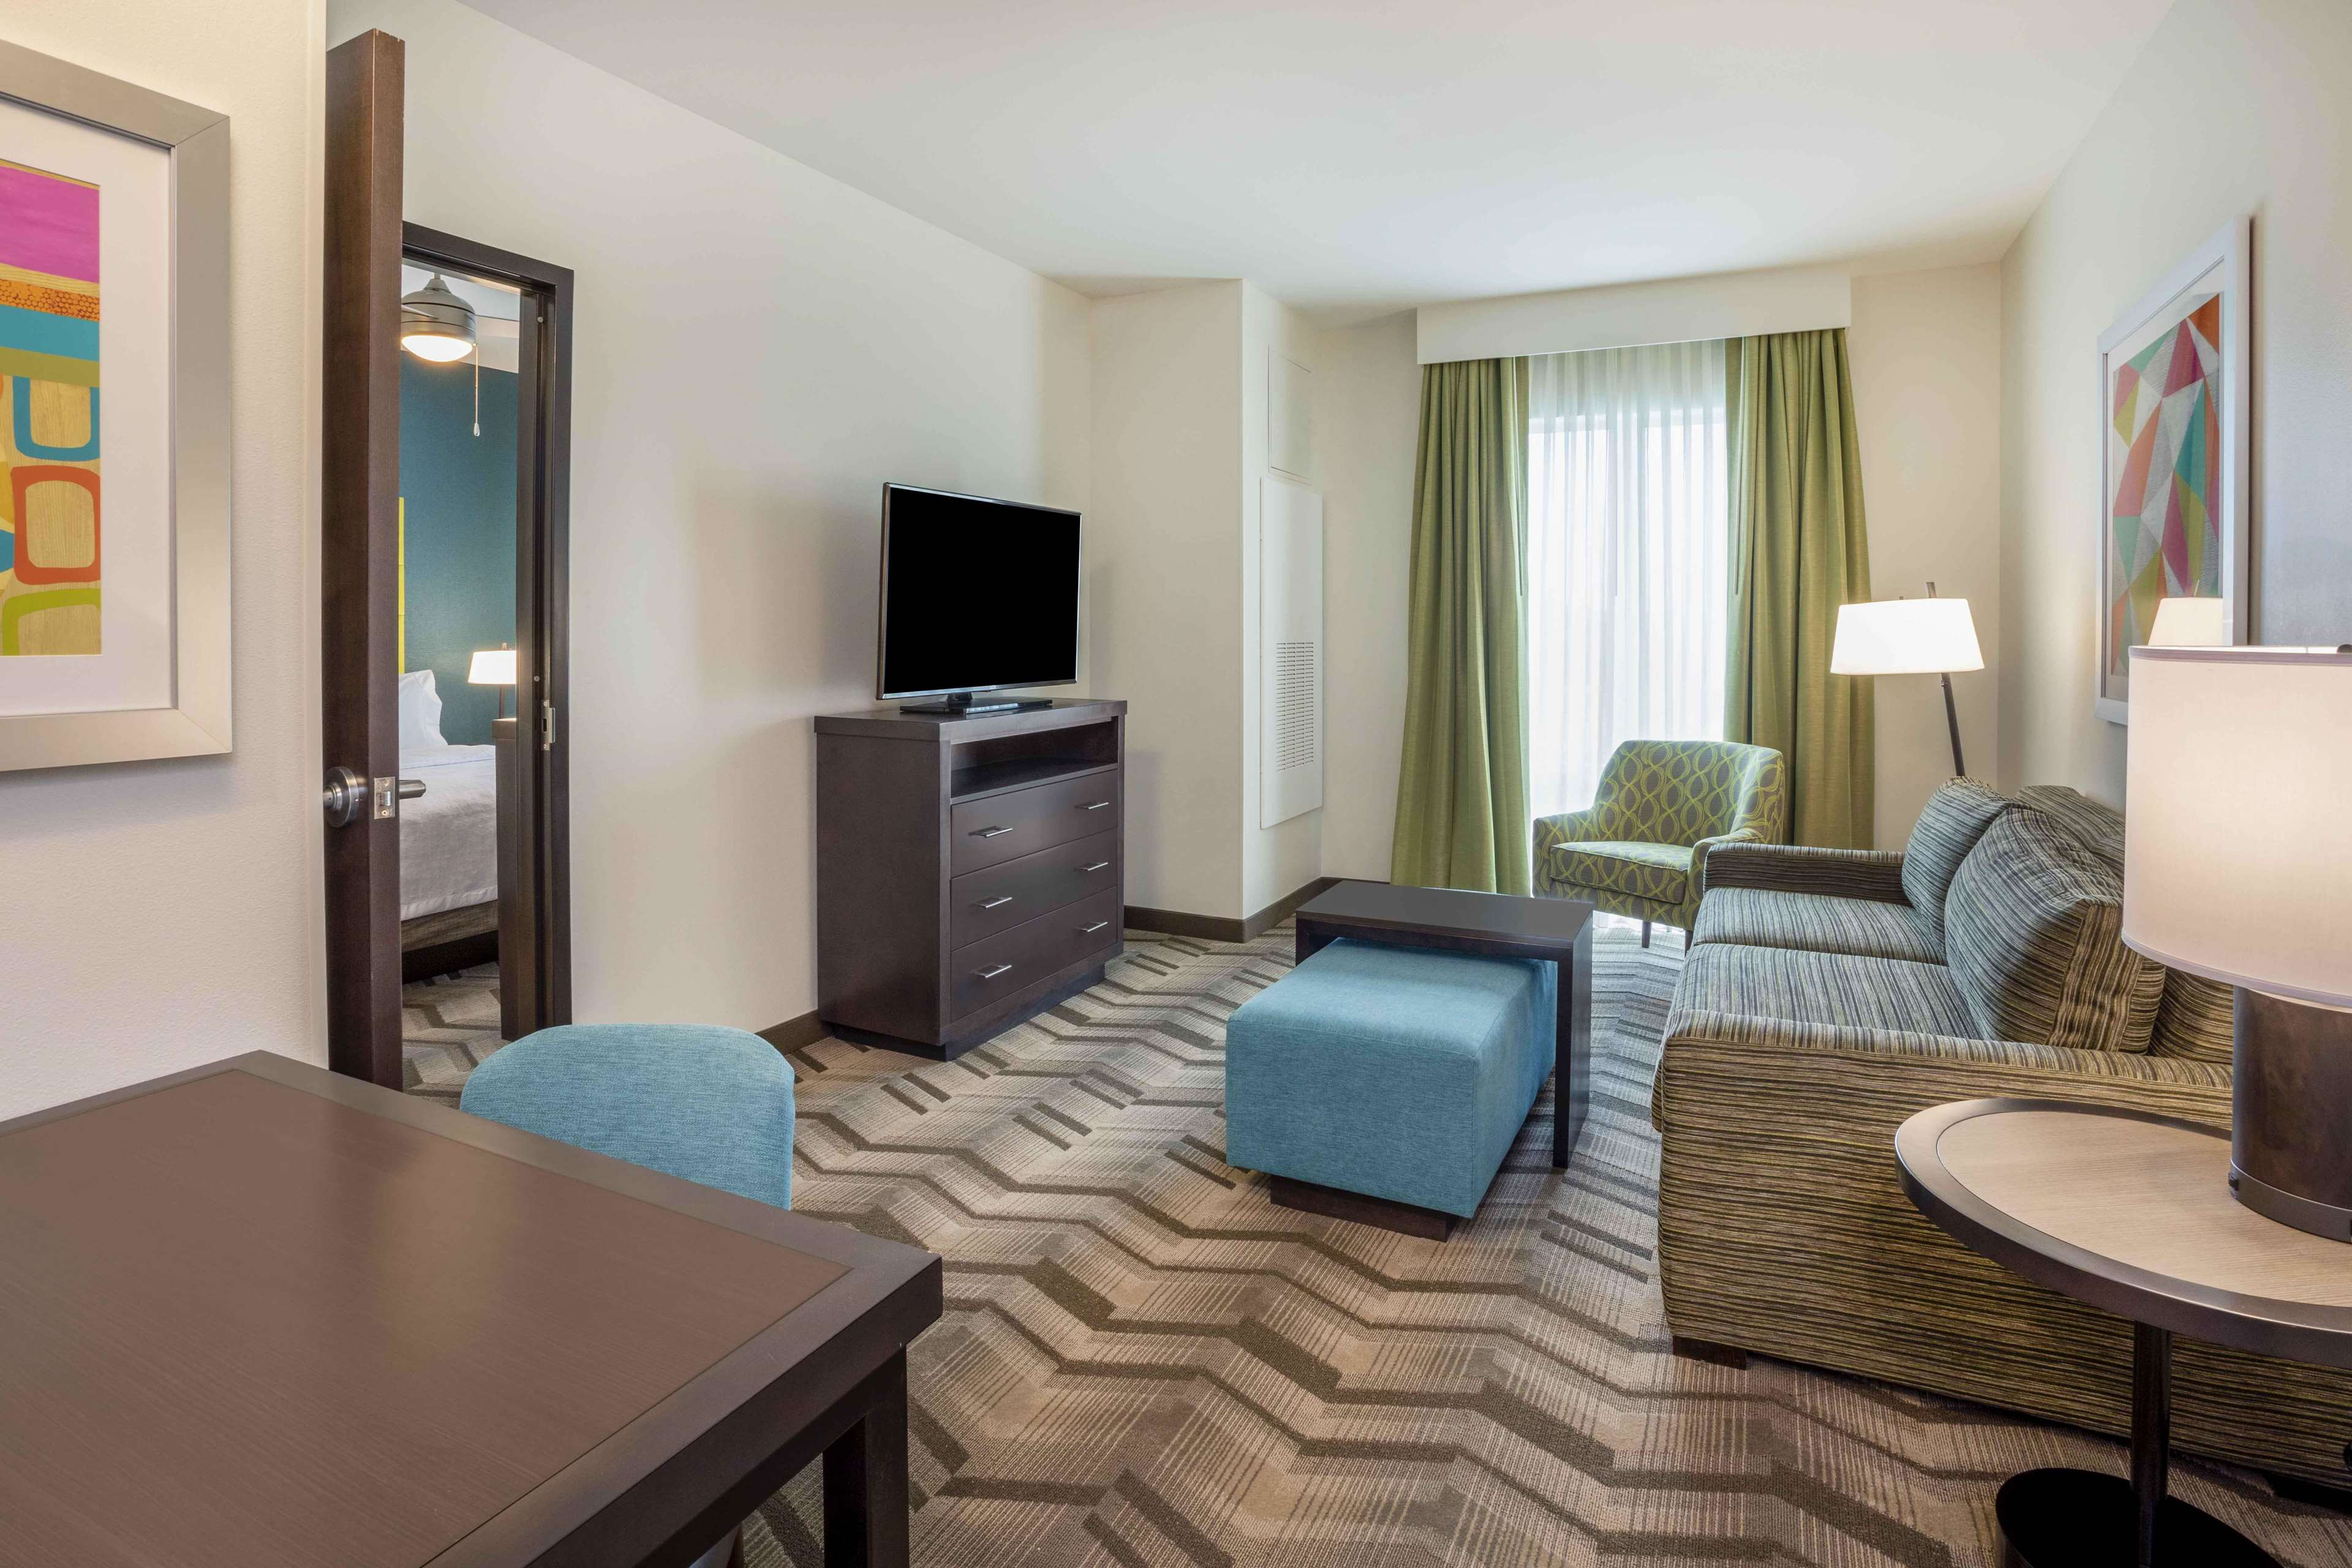 Homewood Suites by Hilton Edina Minneapolis image 31